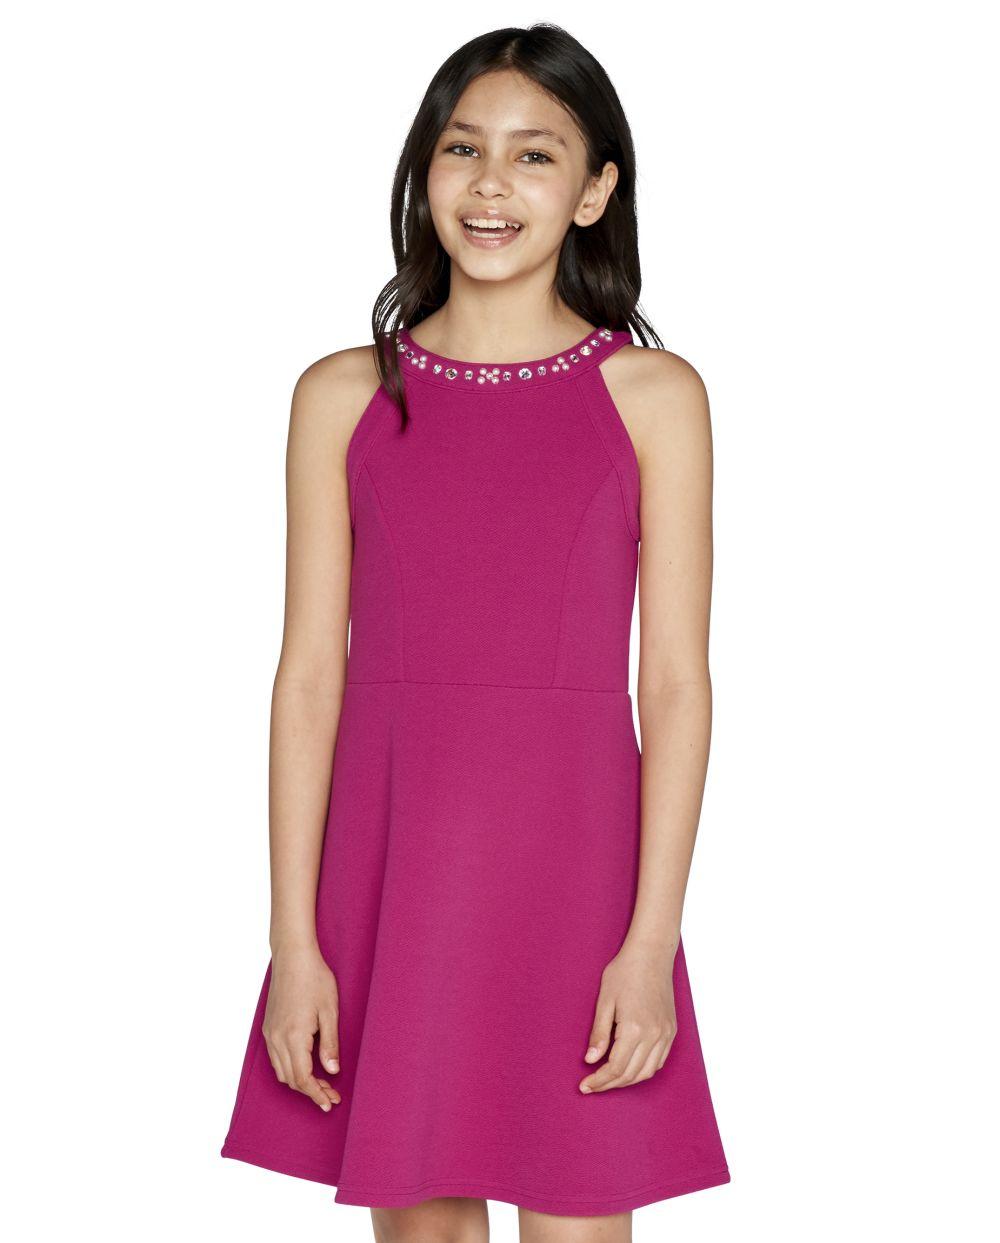 Girls Jeweled Stretch Jacquard Dress - Pink